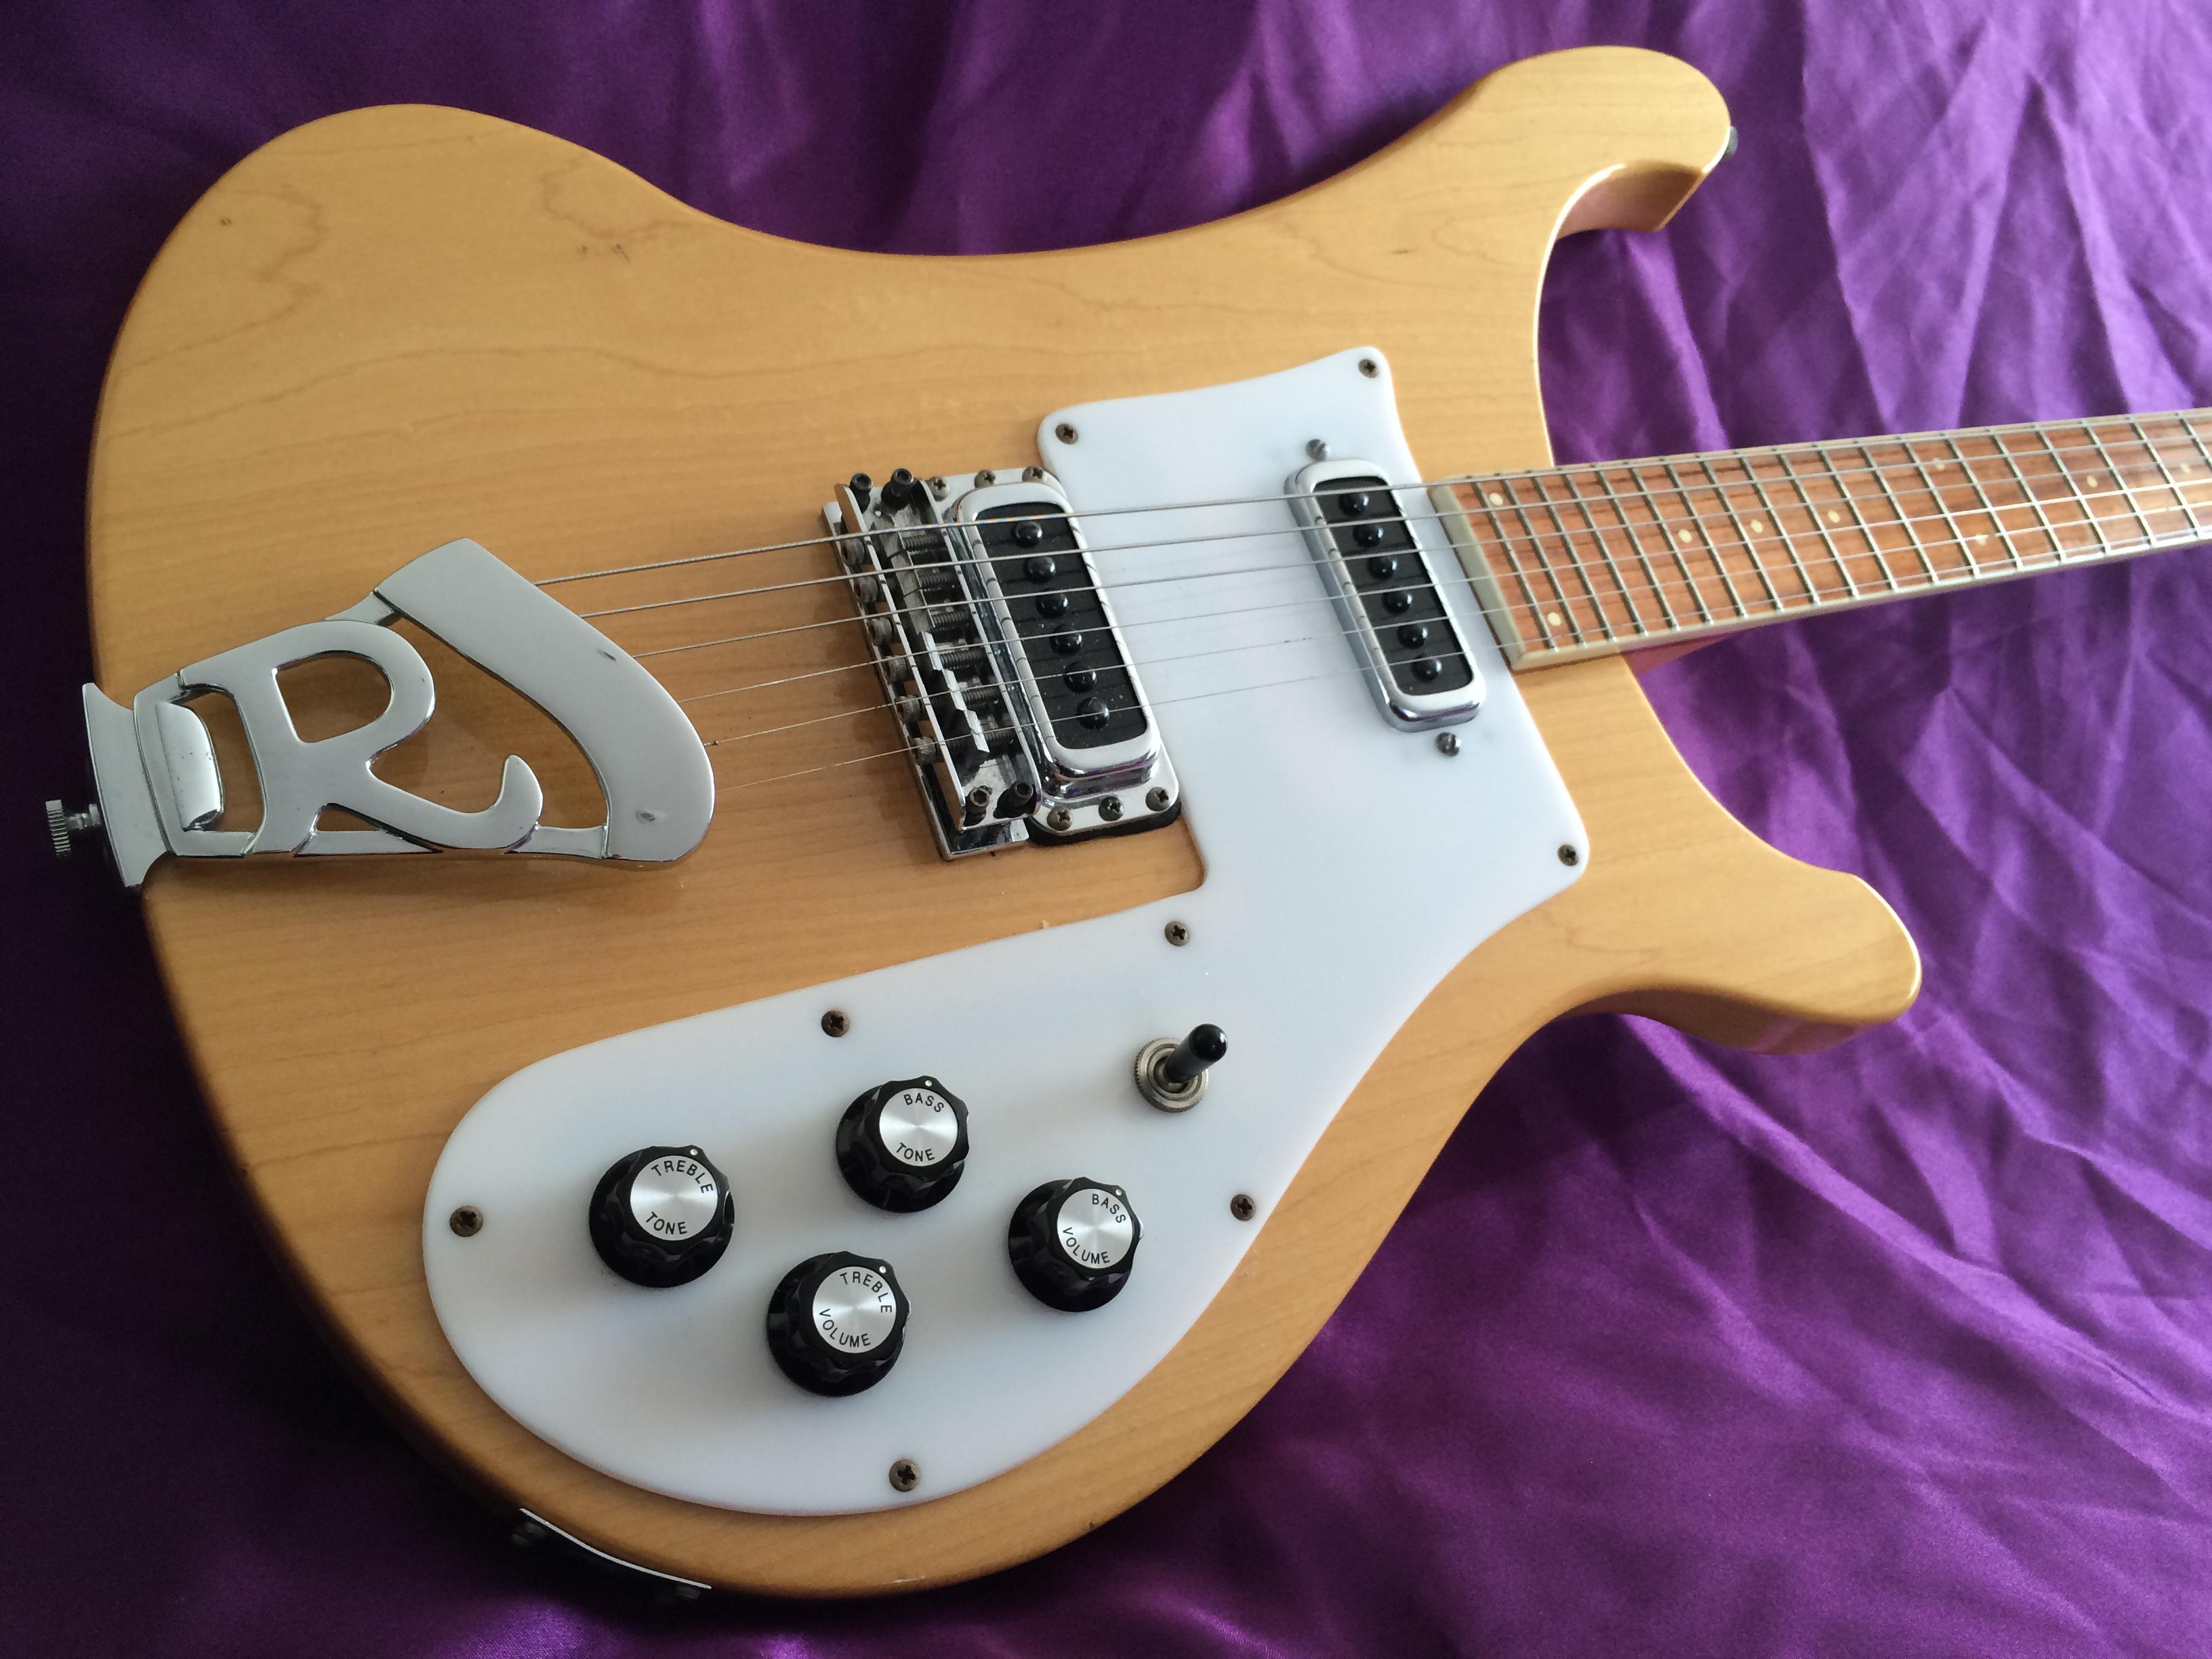 1974 Rickenbacker 480